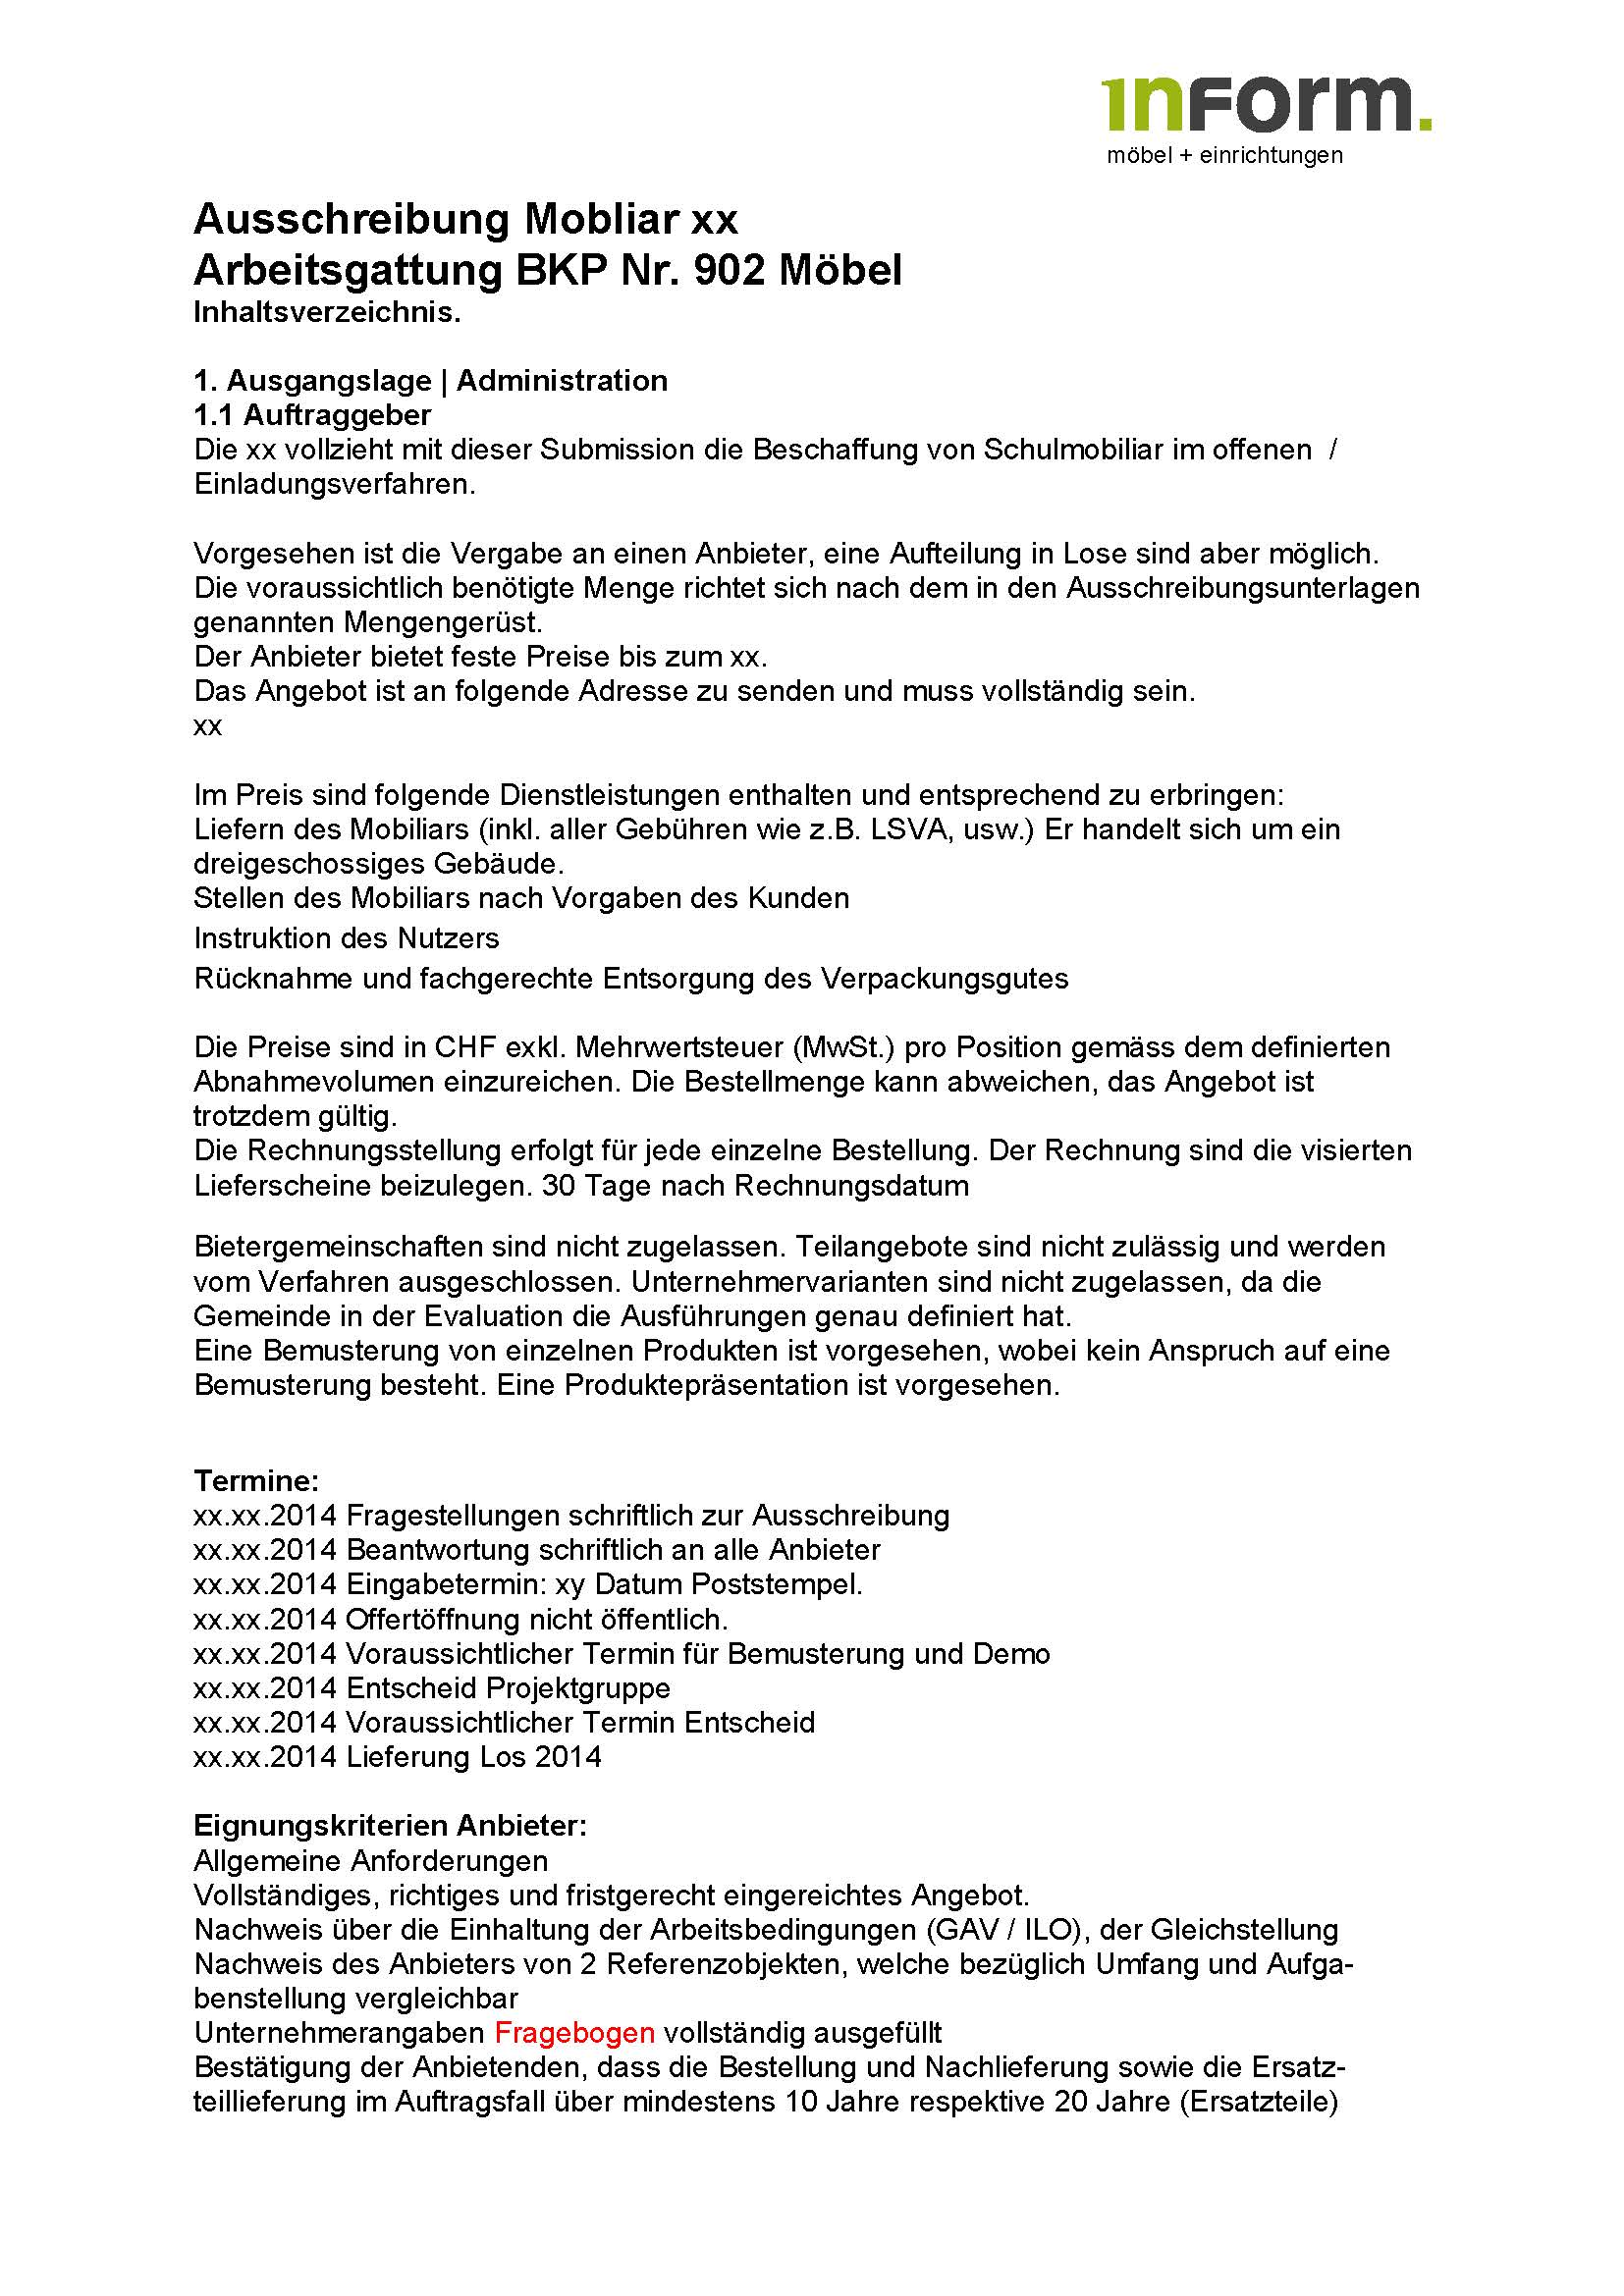 Ausschreibung Mobliar Bsp. Seite 1